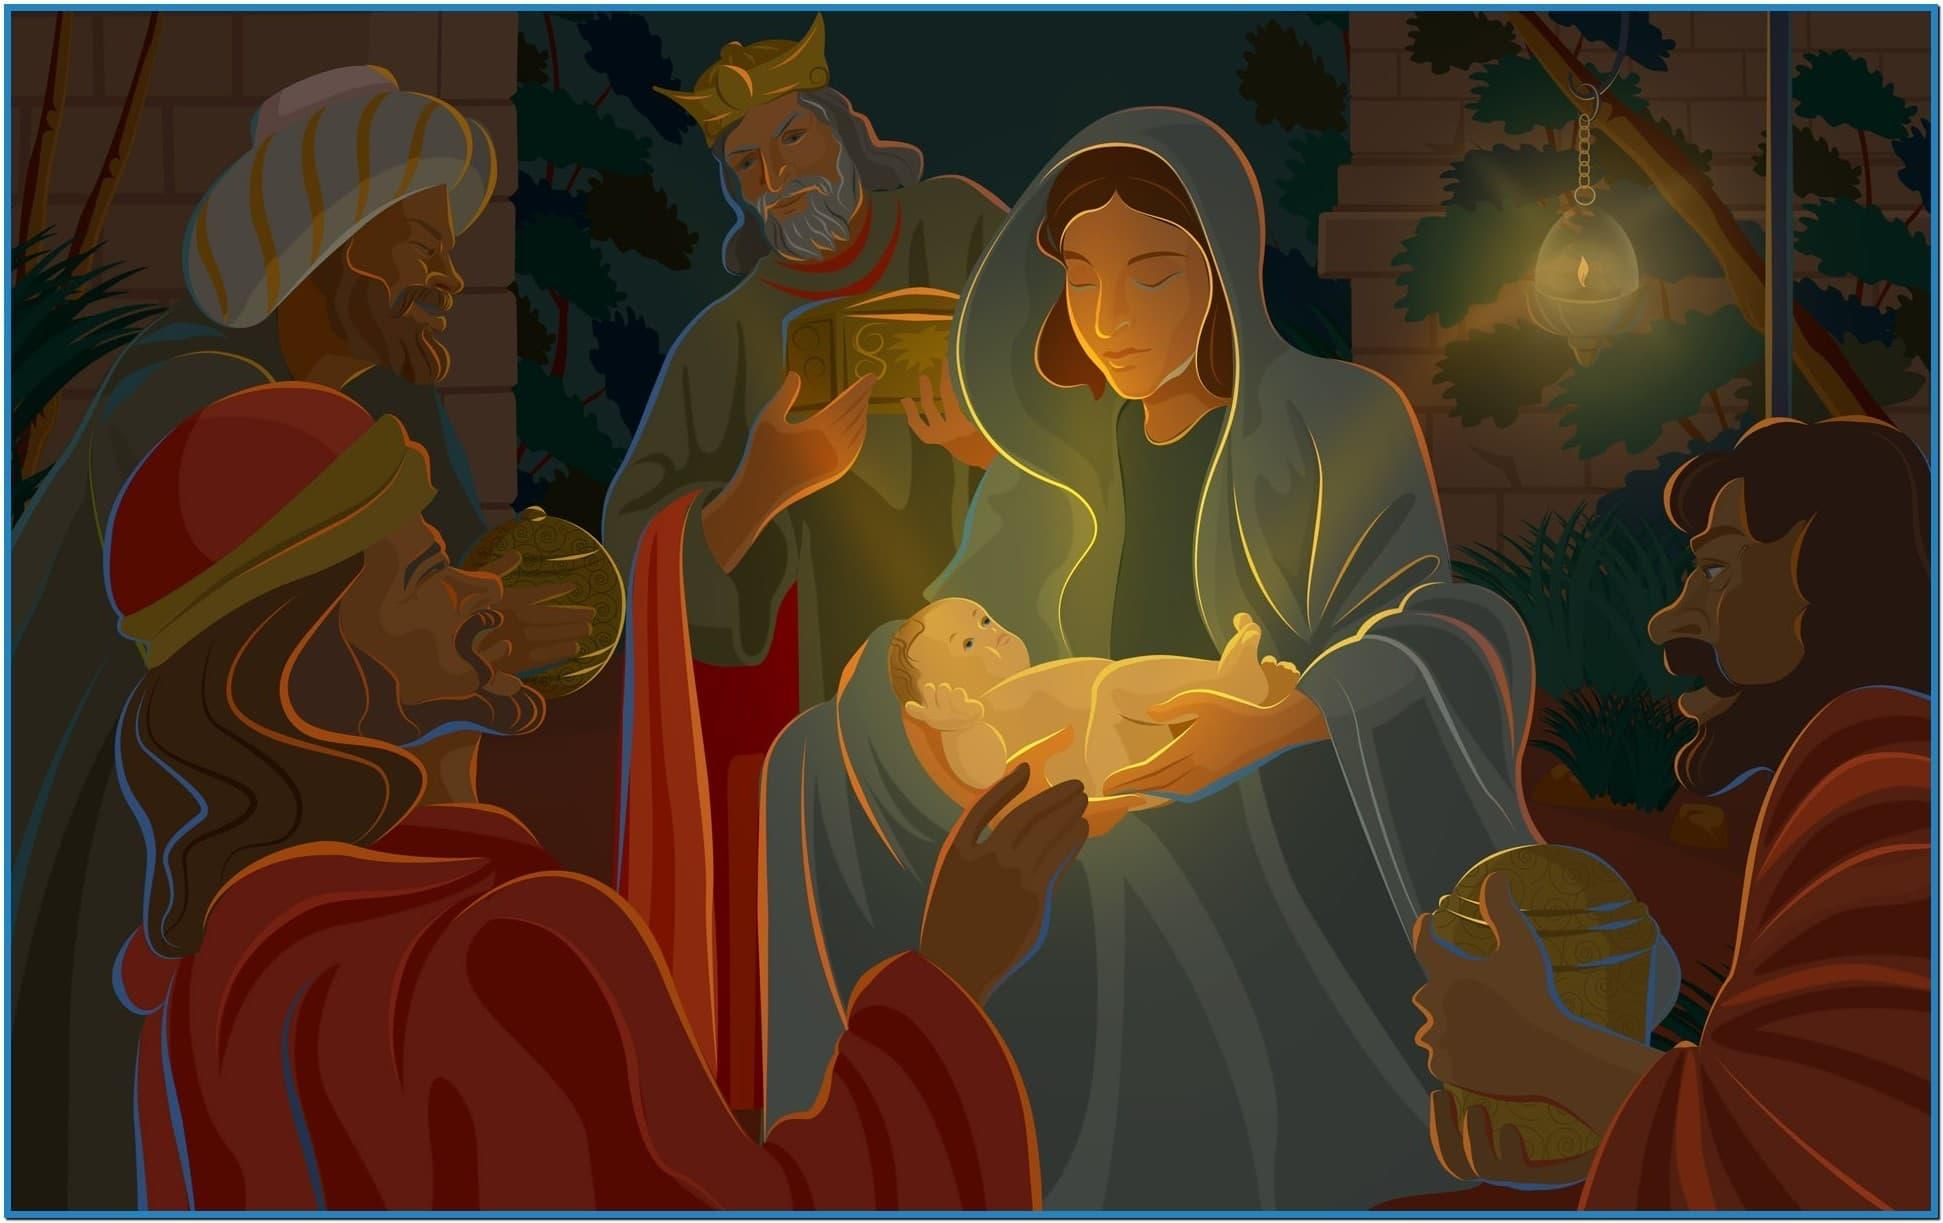 Christian christmas wallpapers and screensavers   Download 1943x1223